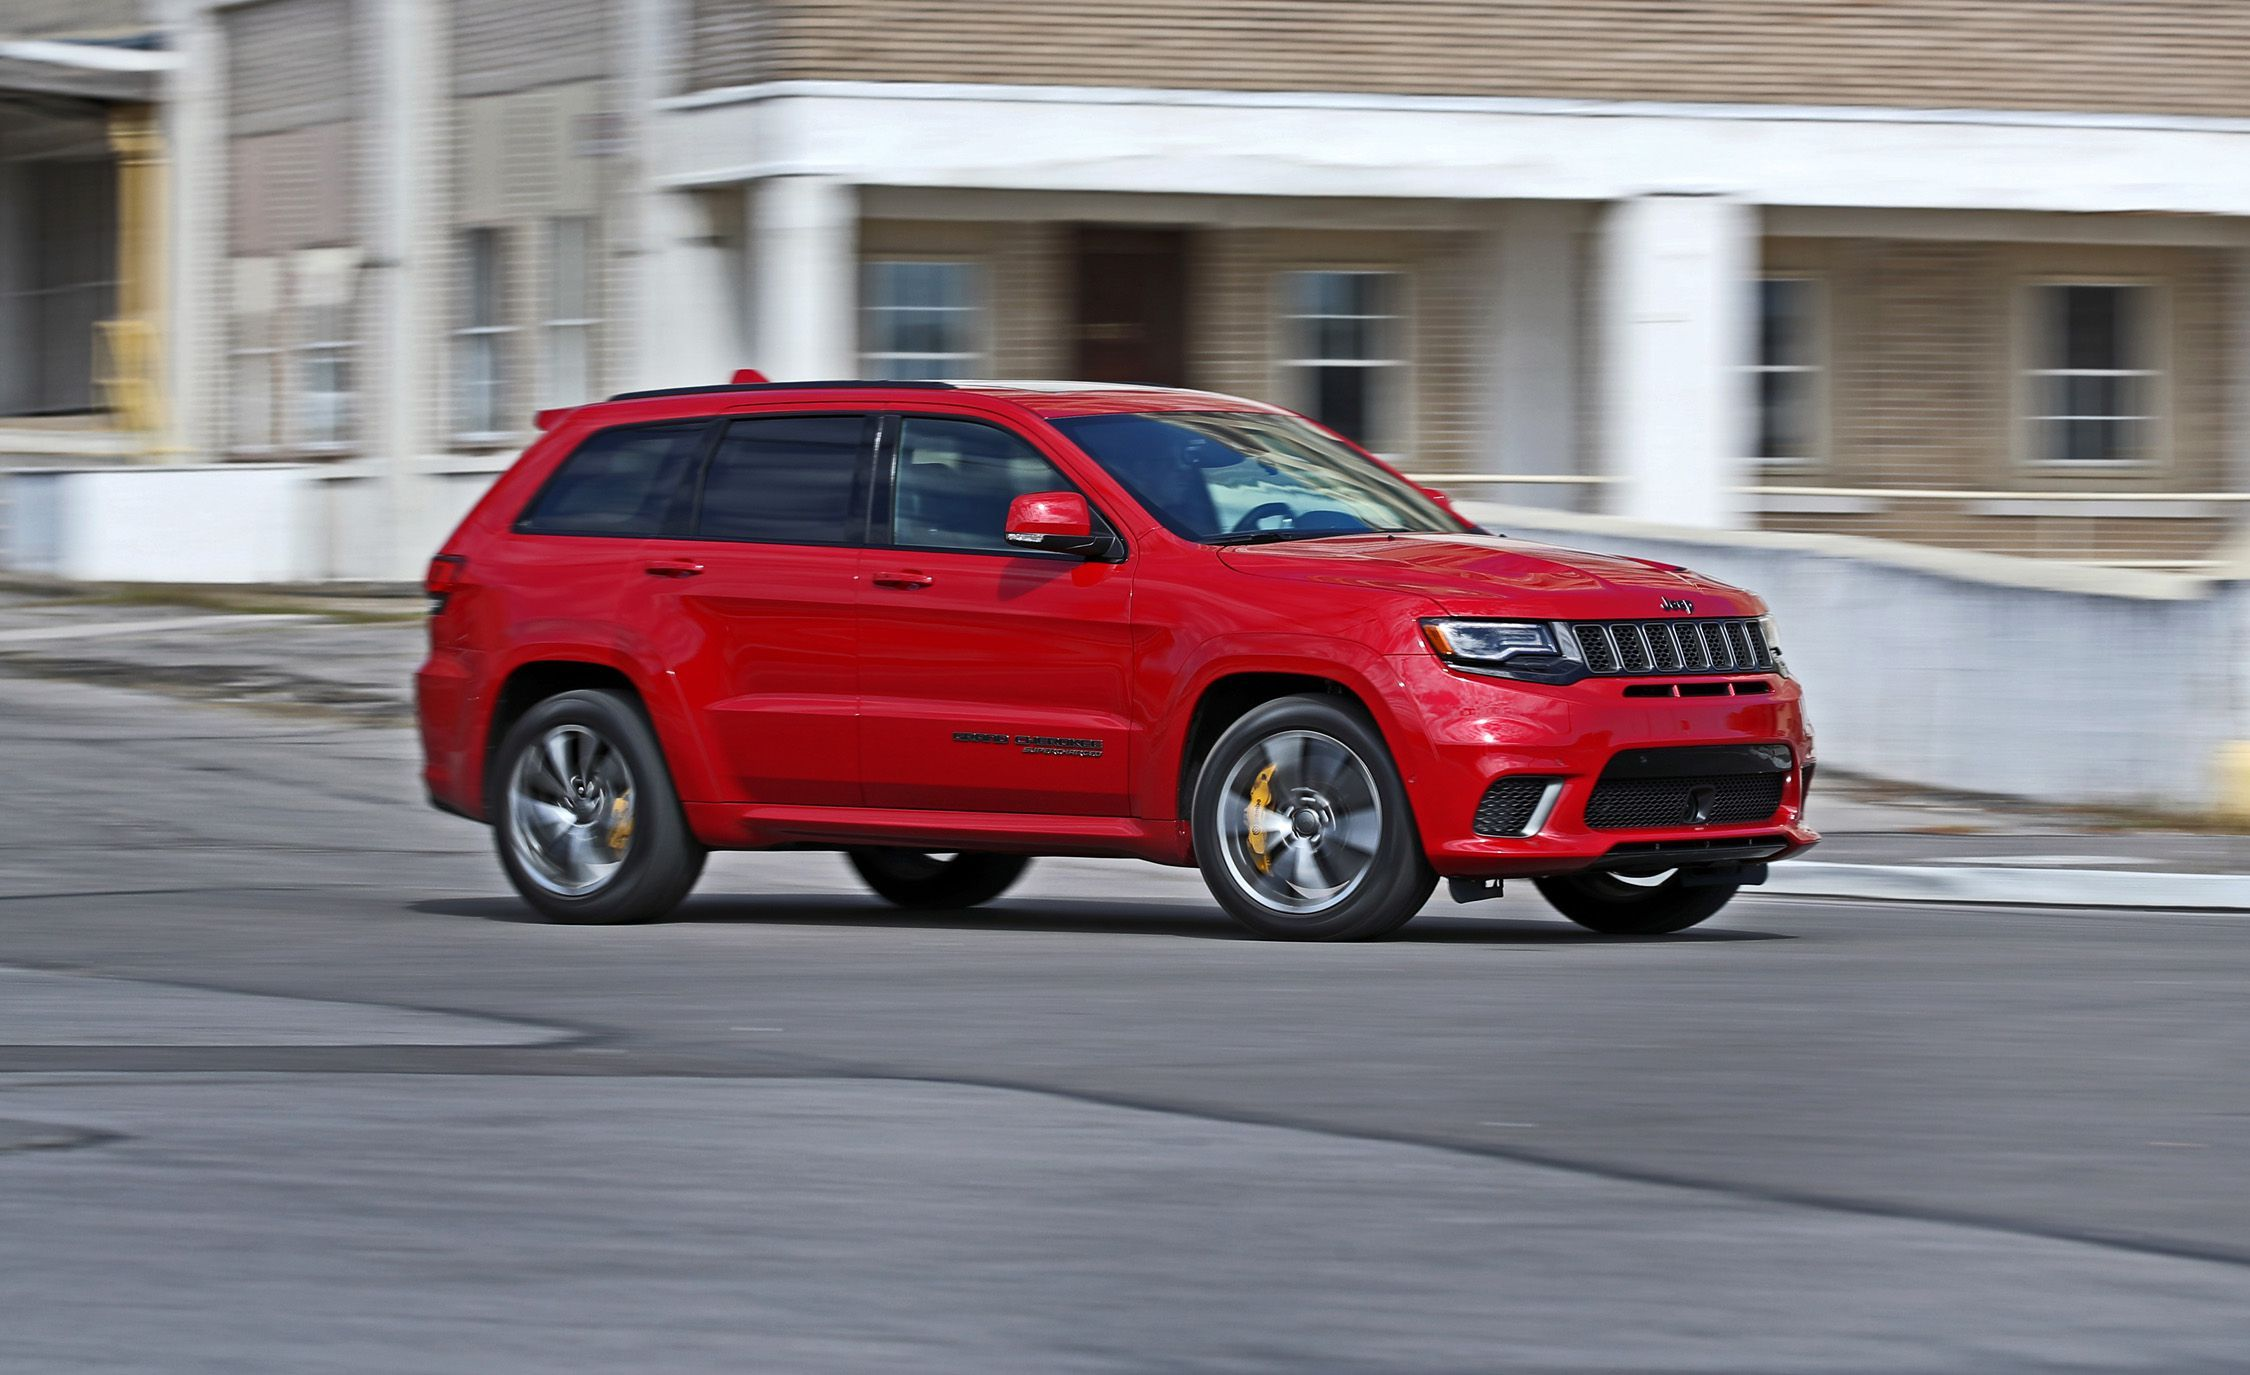 2018 Jeep Grand Cherokee Srt Trackhawk In Depth Review Gallery Jeep Grand Cherokee Srt Jeep Grand Cherokee Srt